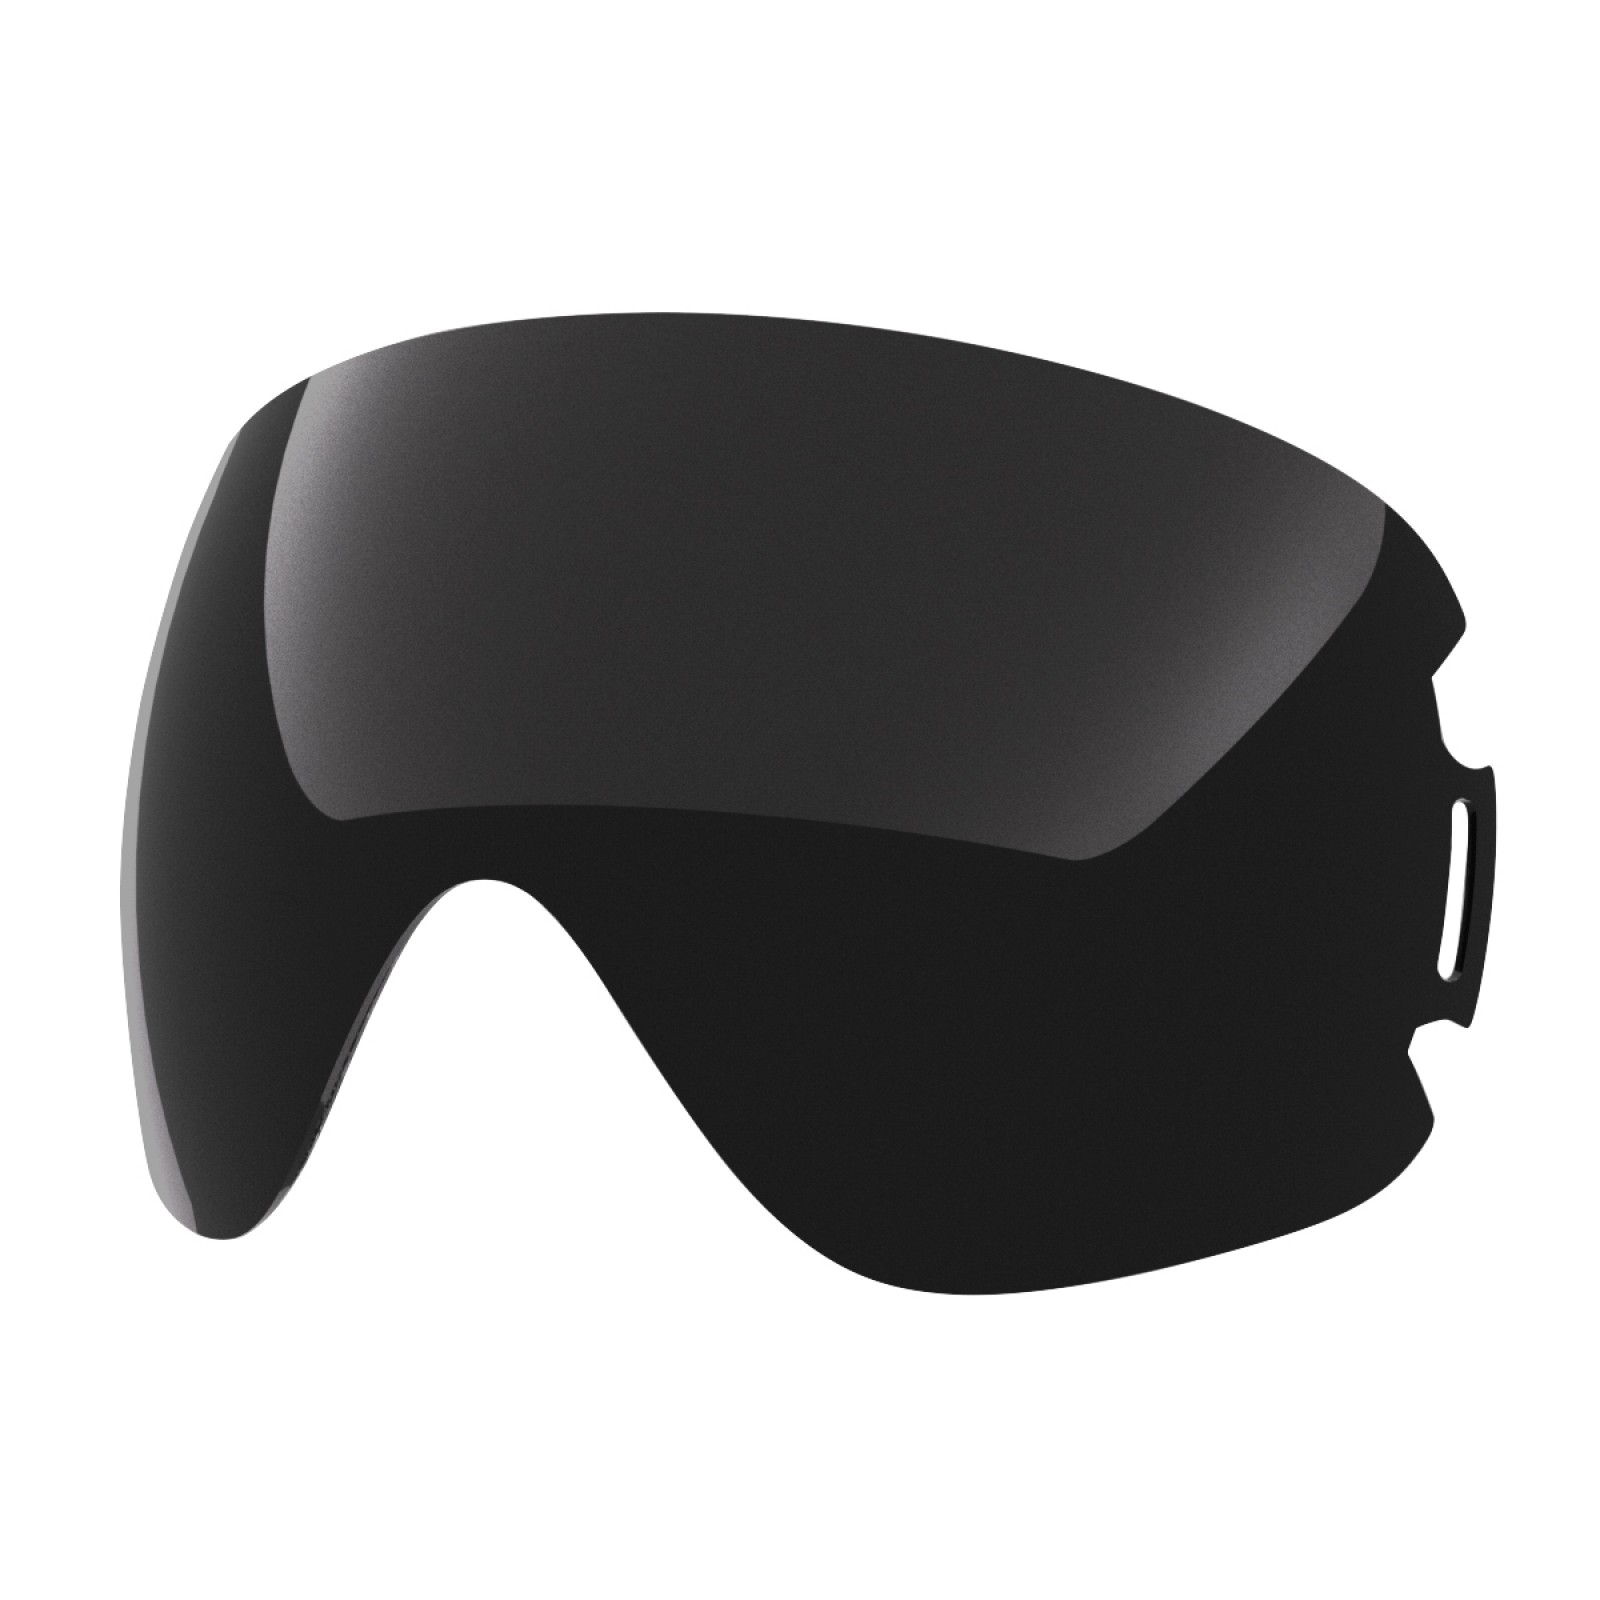 DARK SMOKE lens for  Open goggle